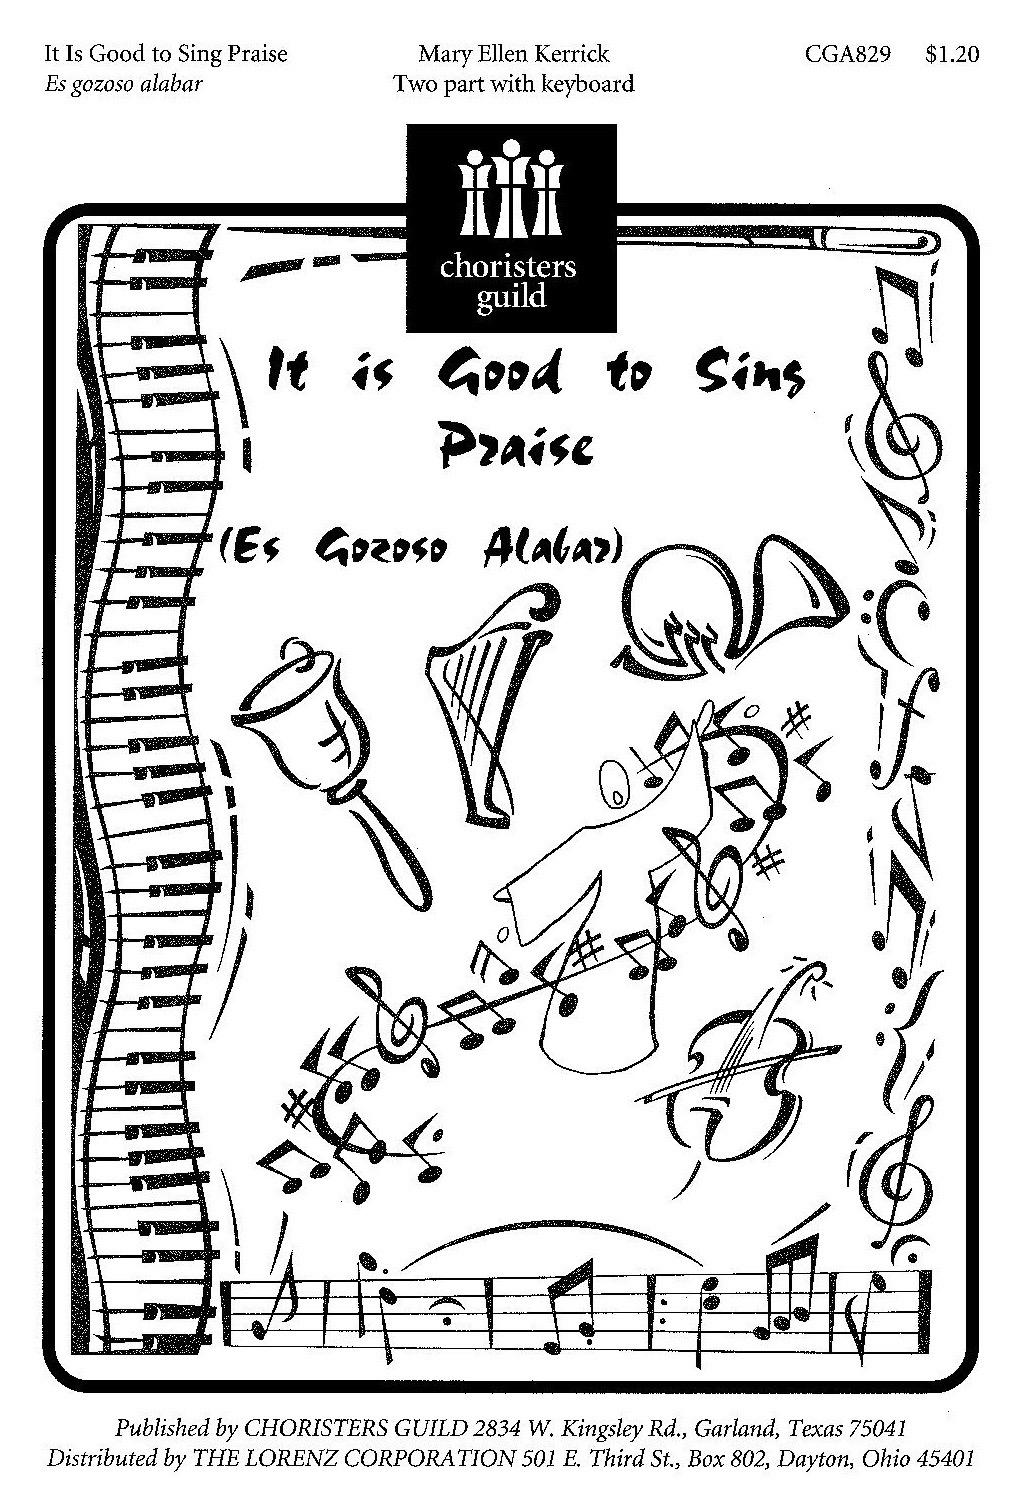 It Is Good to Sing Praise Es gozoso alabar